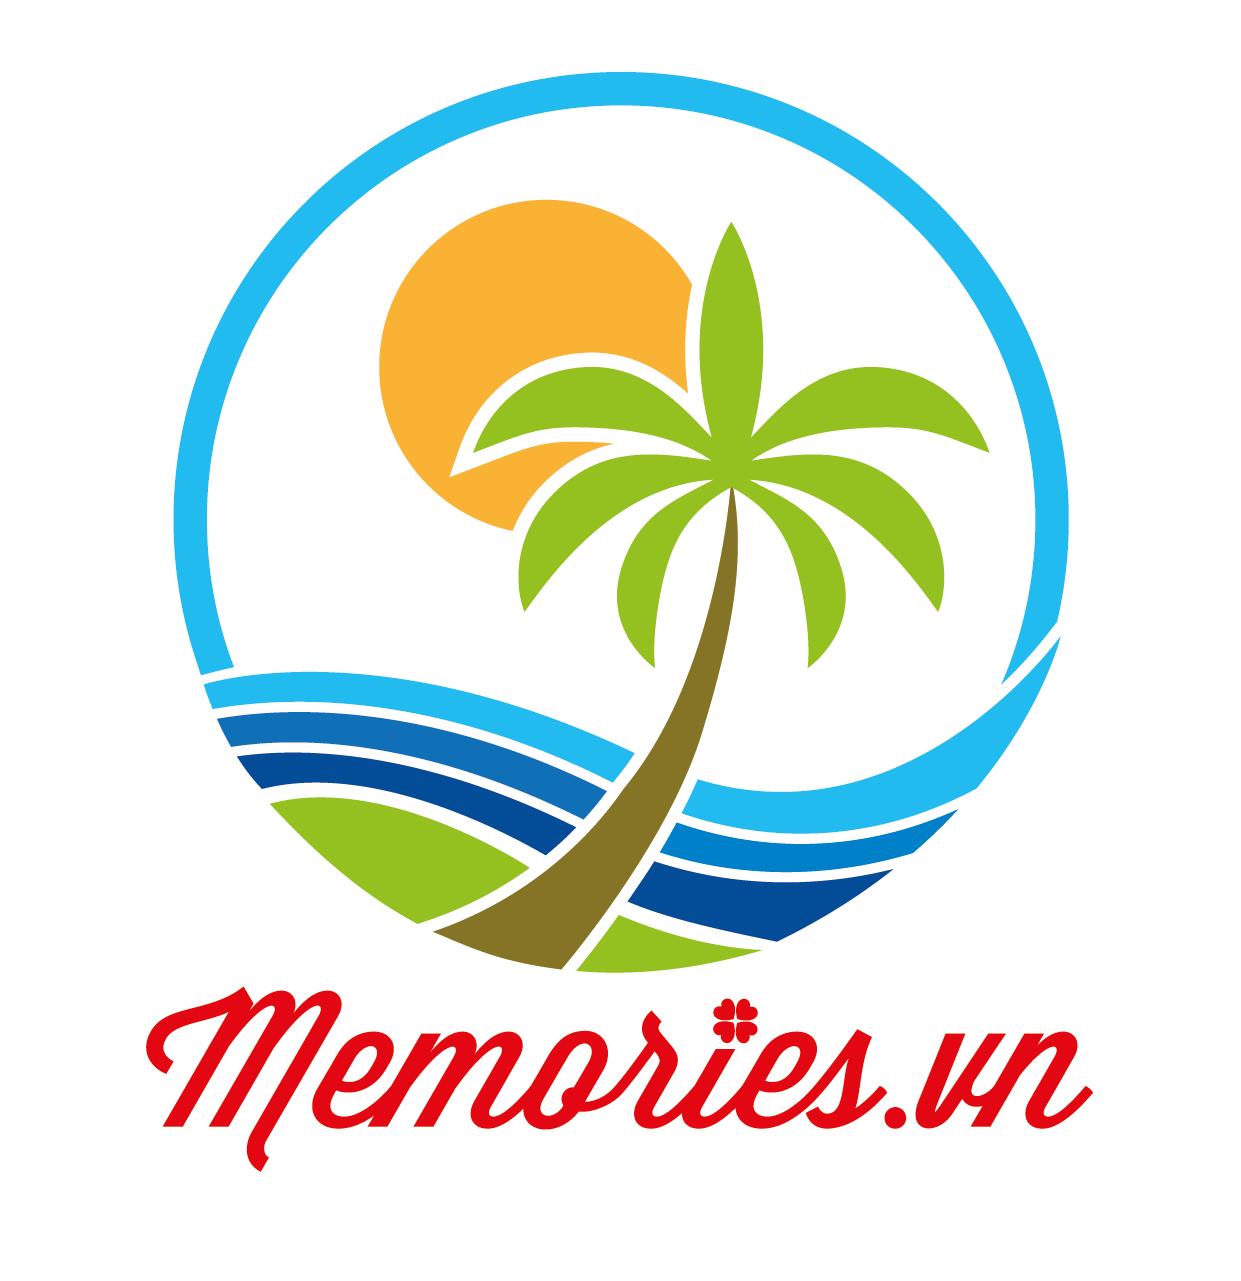 Memories Media, Entertainment & Arts | Baby & Craft Gifts Shop